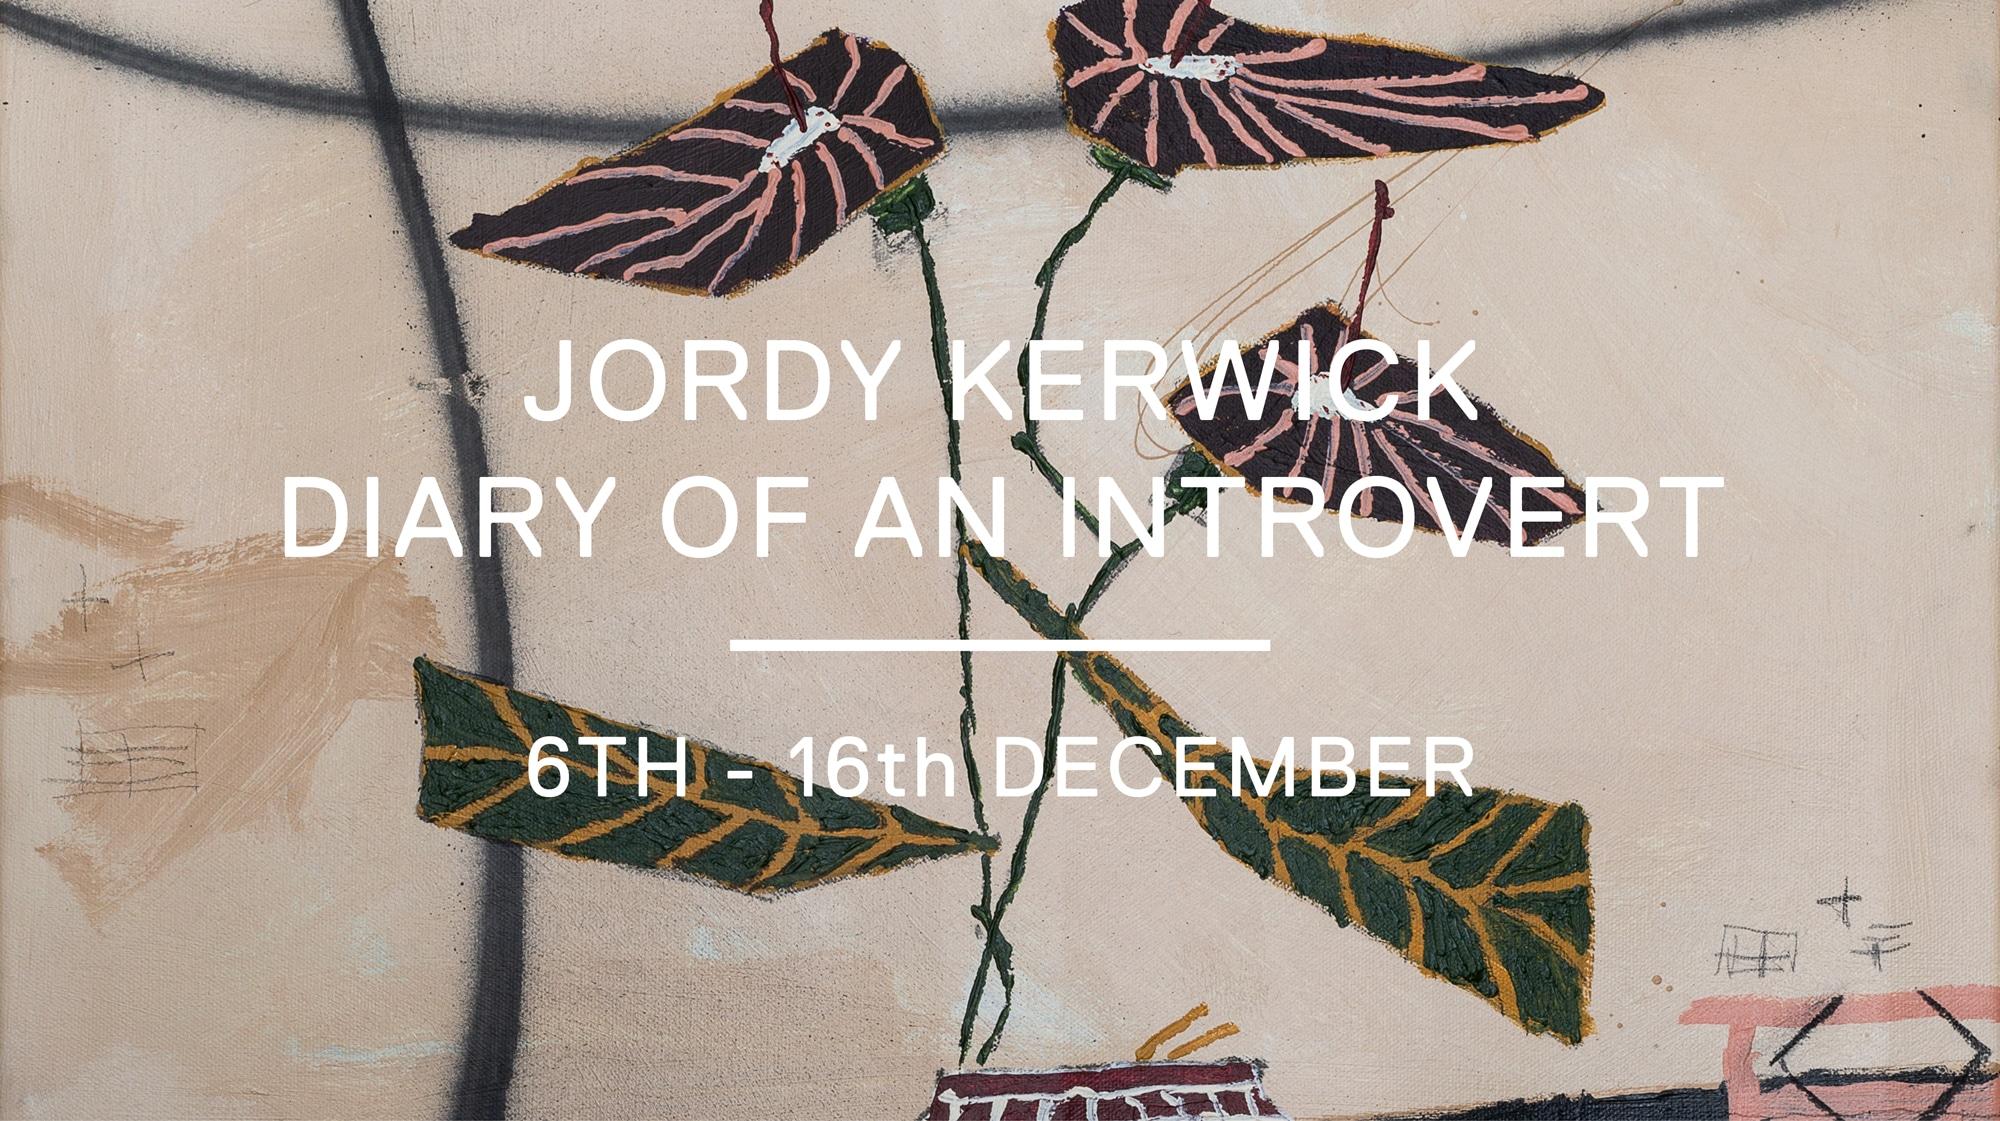 diary of an introvert - jordy kerwick